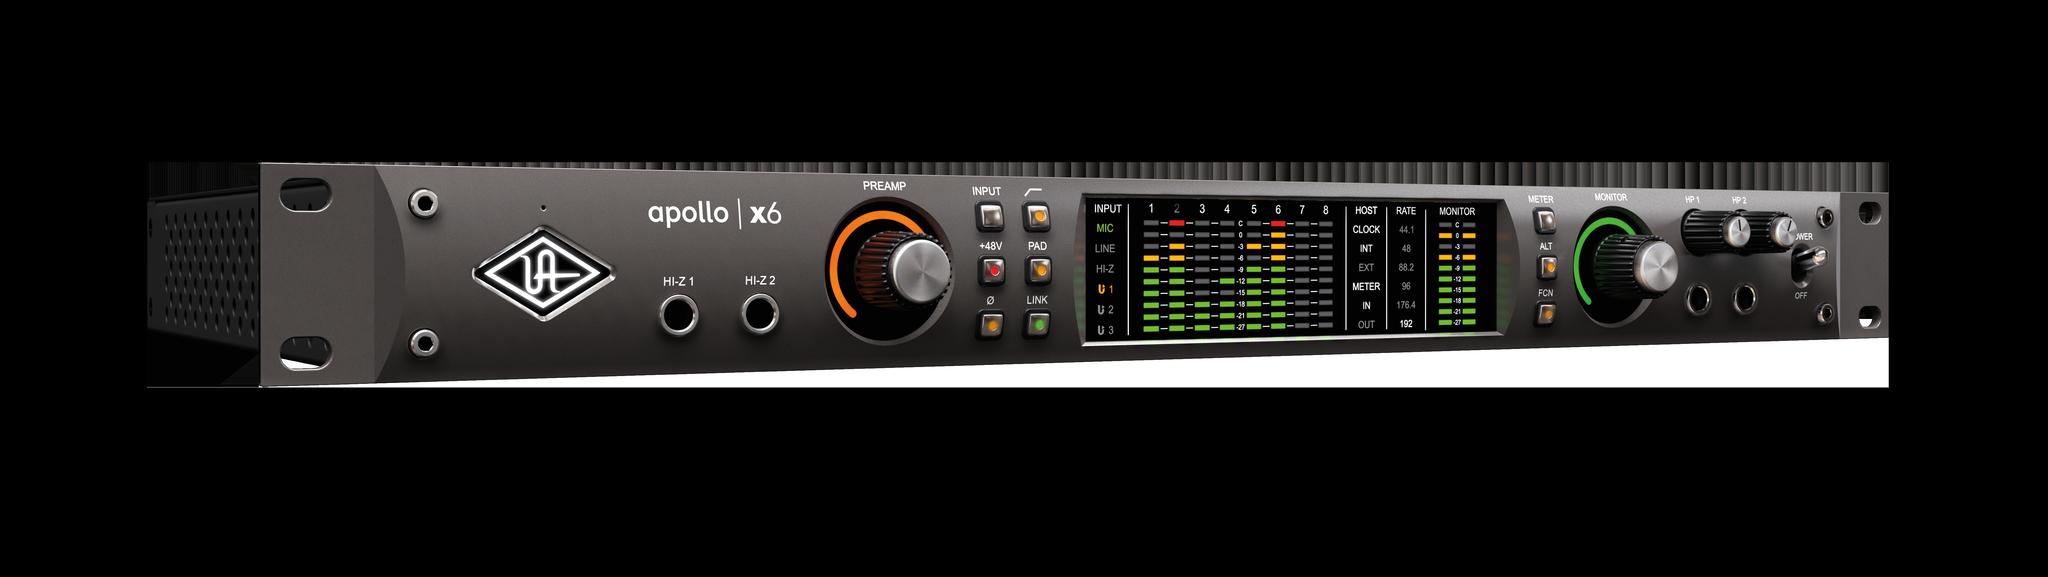 Universal Audio Apollo X6 (Thunderbolt 3)